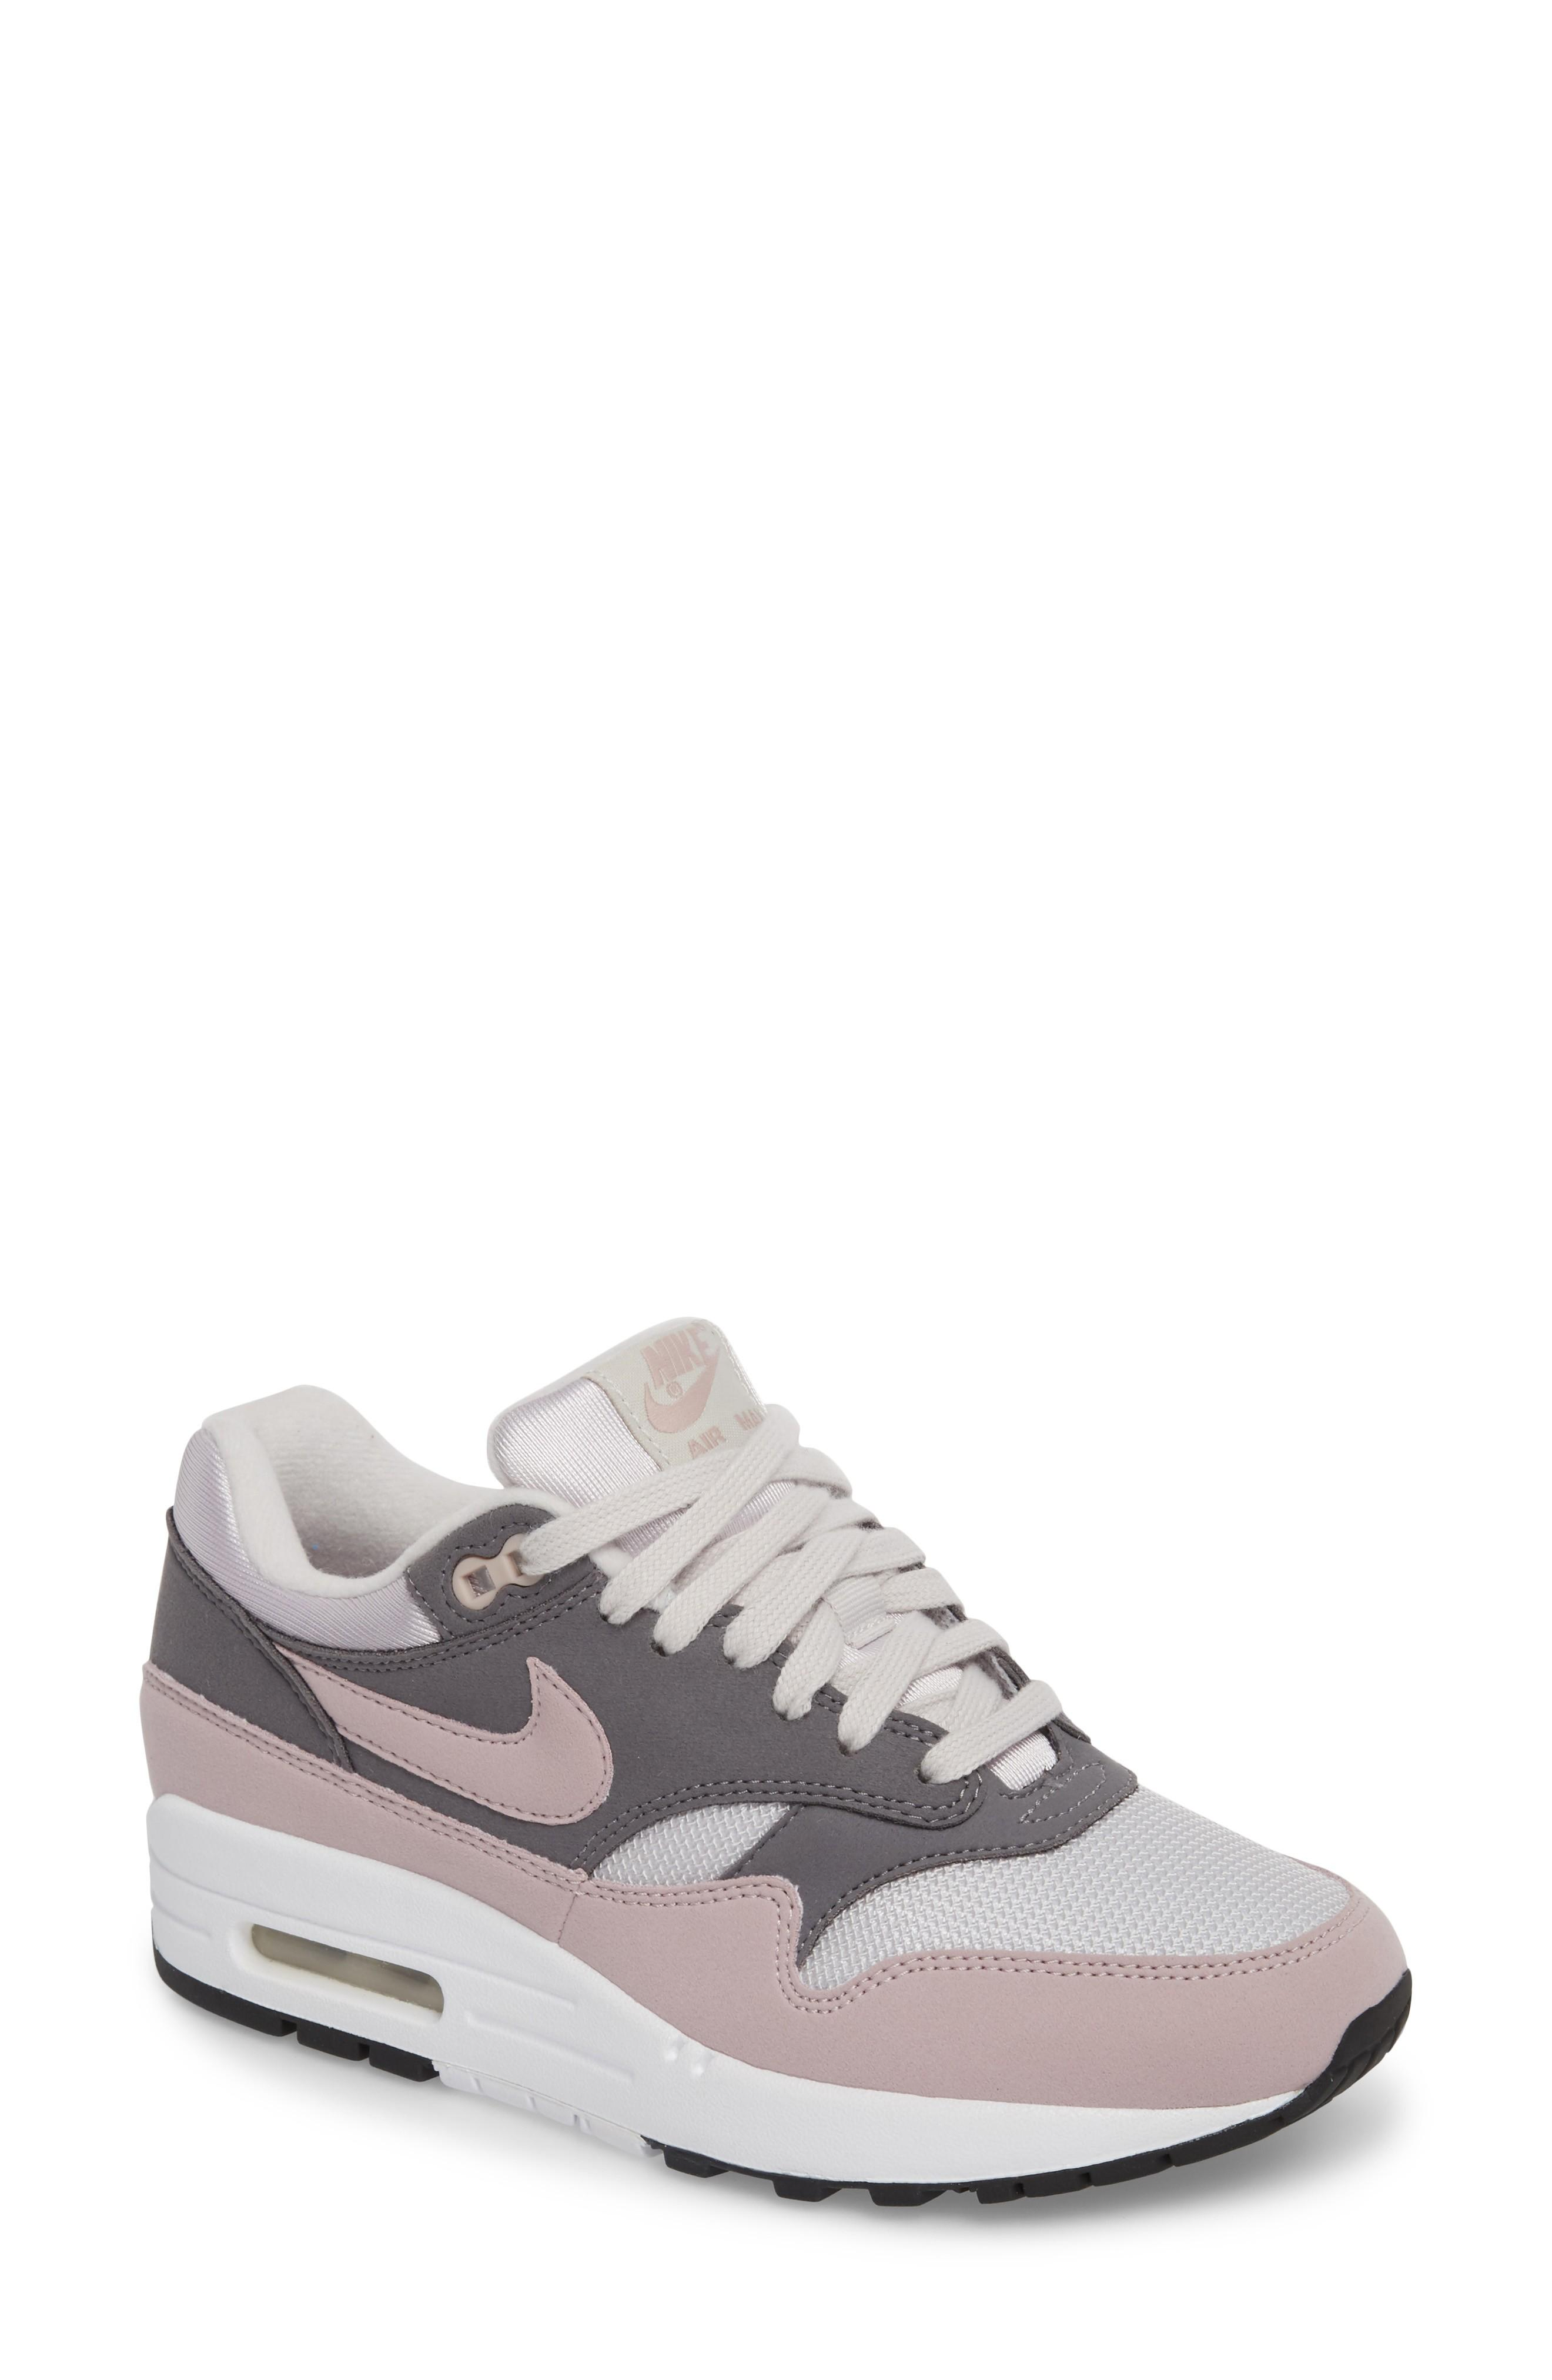 pretty nice f0fca 1b288 Nike  Air Max 1 Nd  Sneaker In Vast Grey  Particle Rose